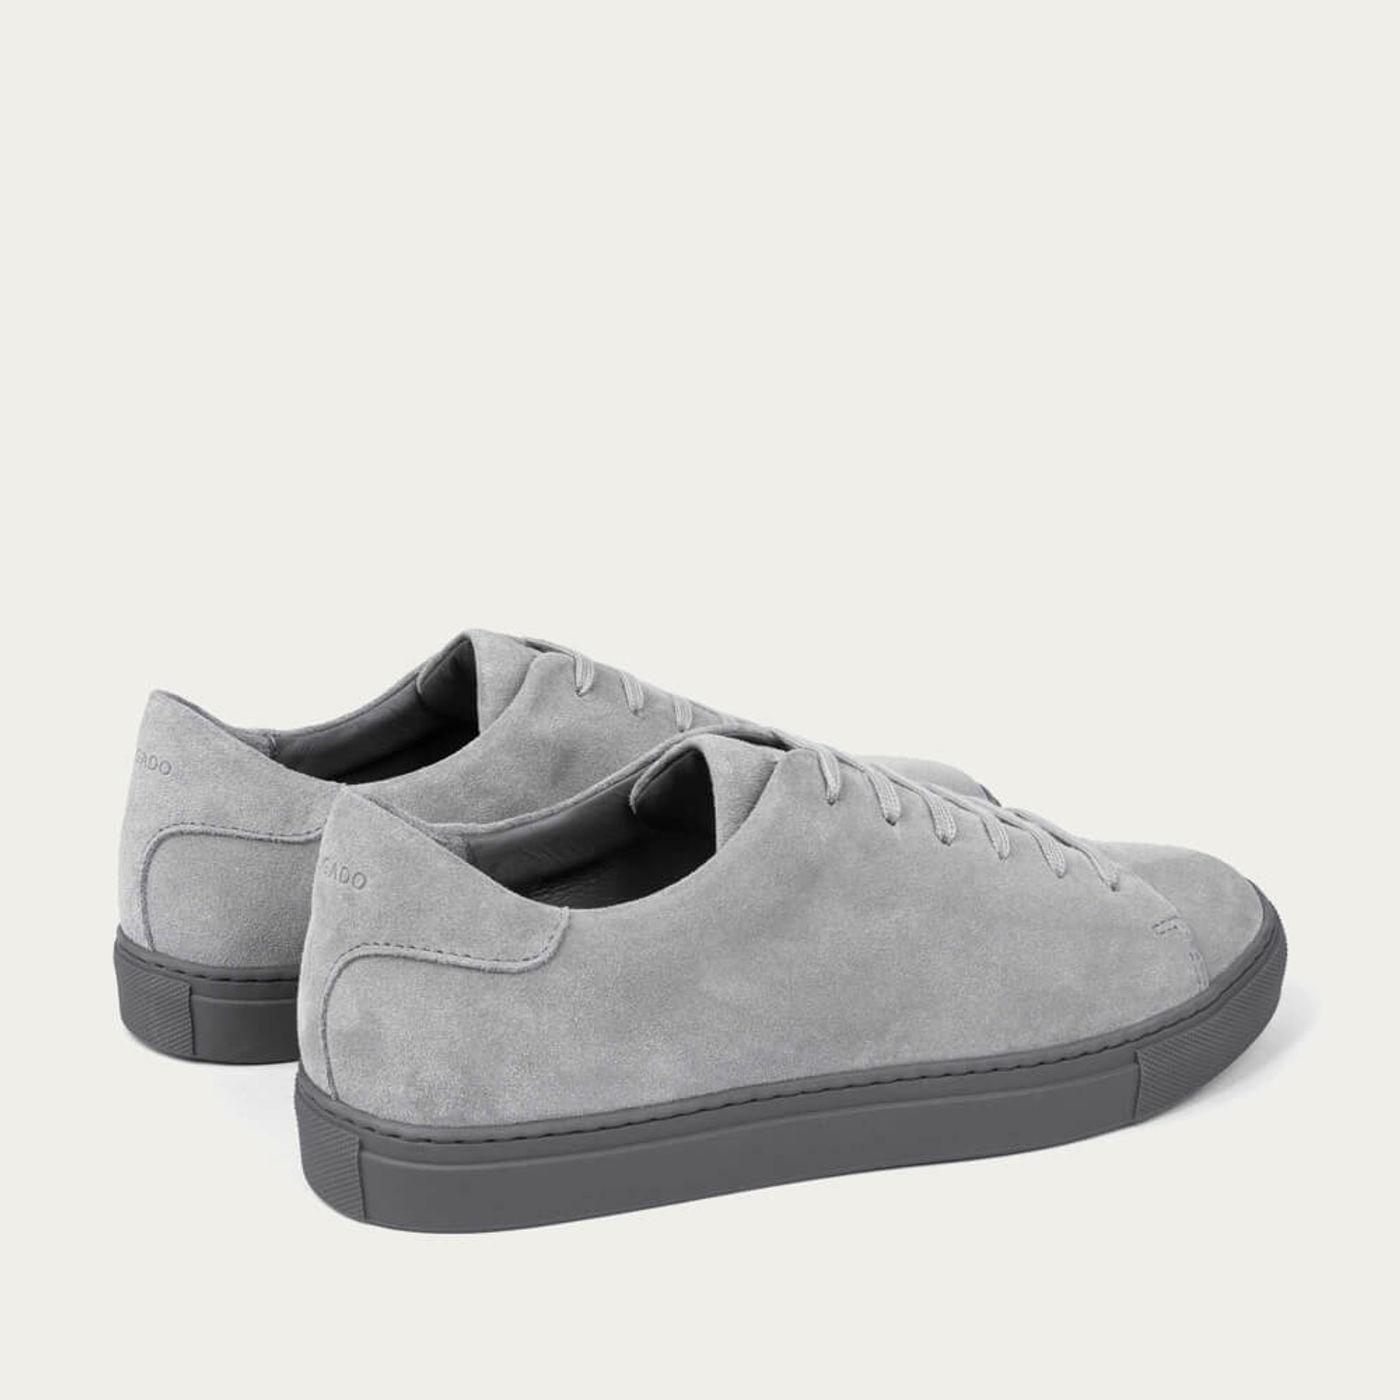 Gray Umberto Suede Sneakers   Bombinate